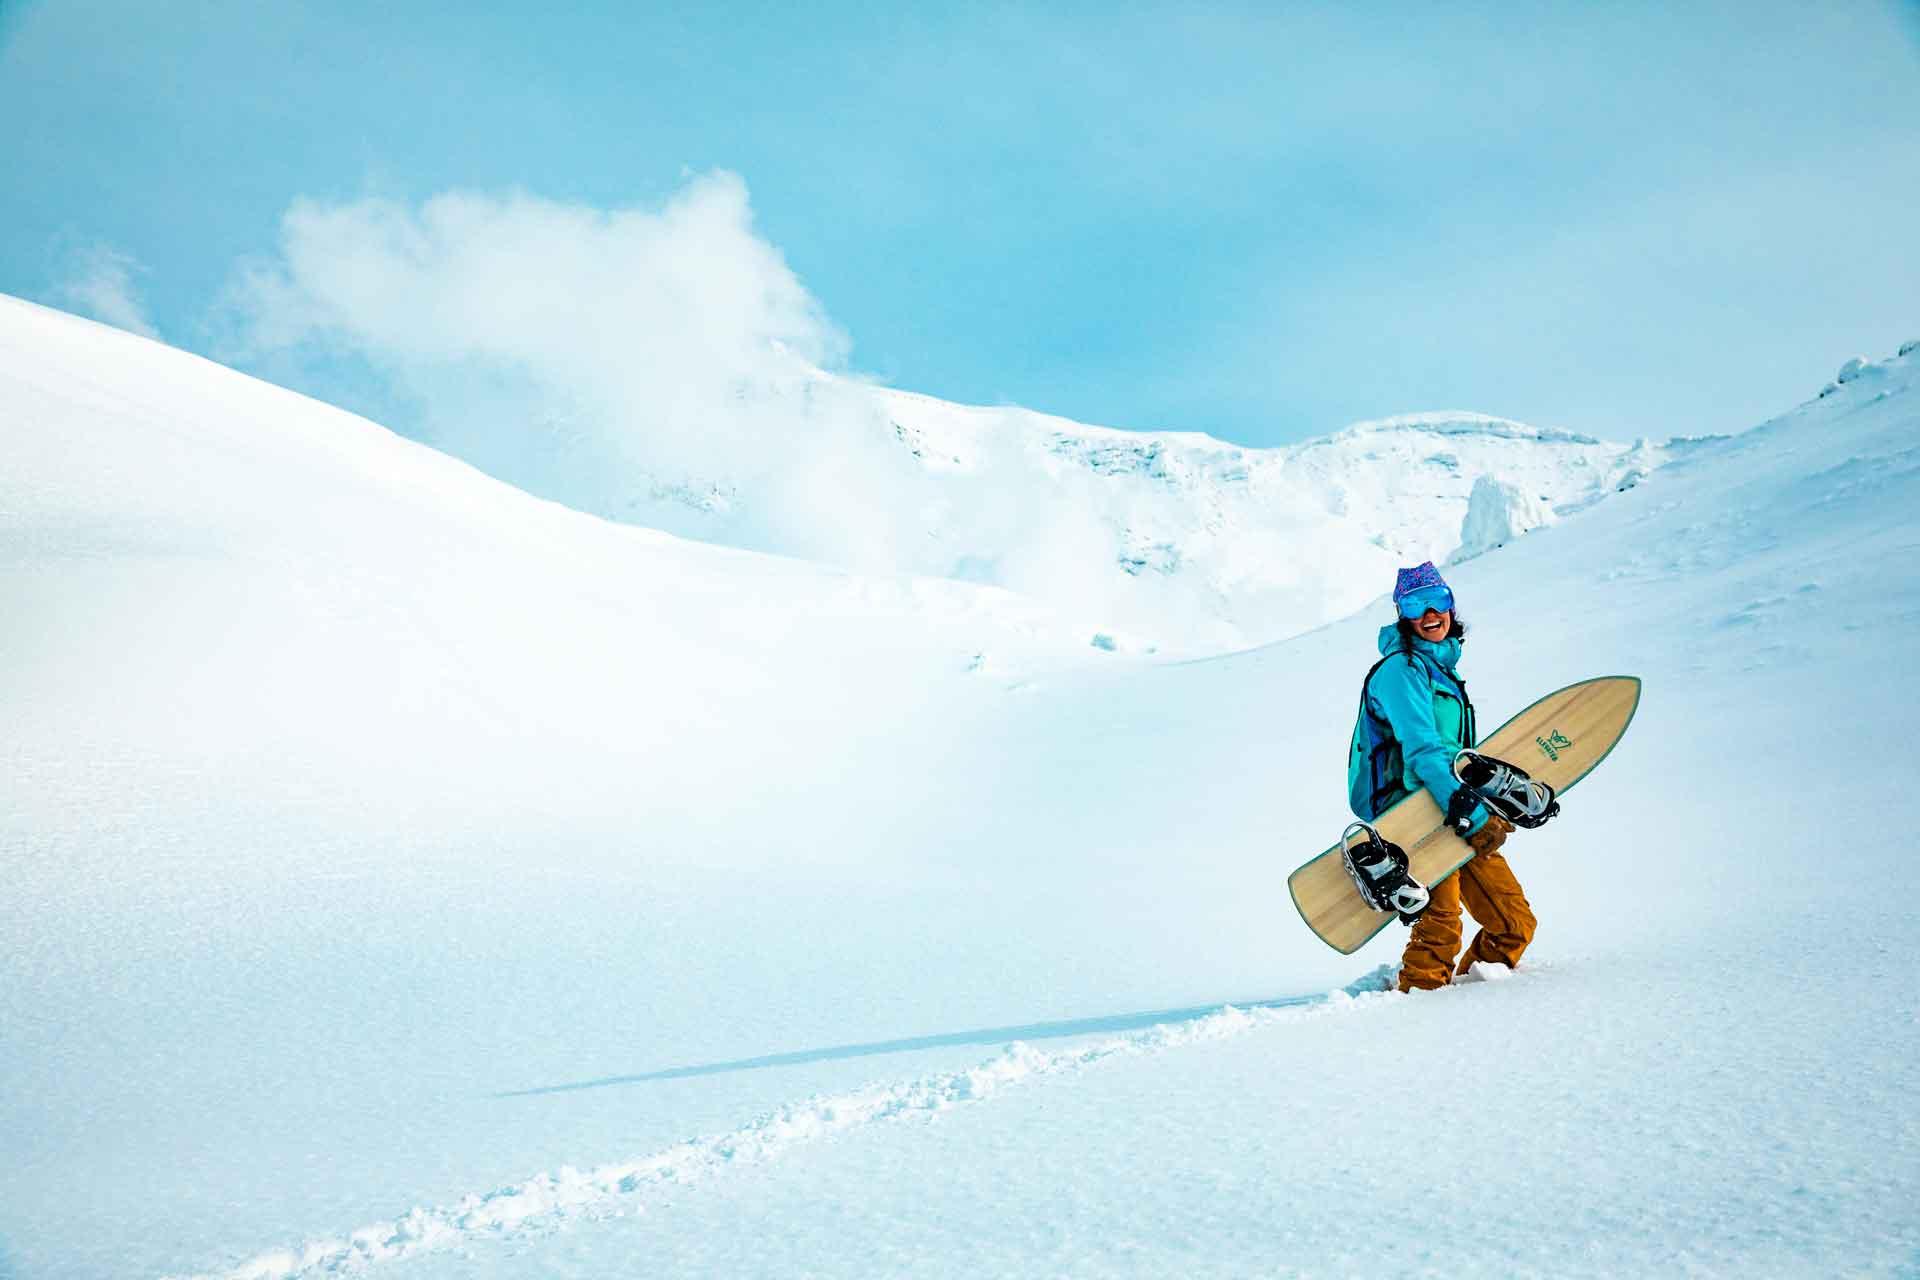 Shawna Paoli posing with the 4'6 Minni Driver snowboard.